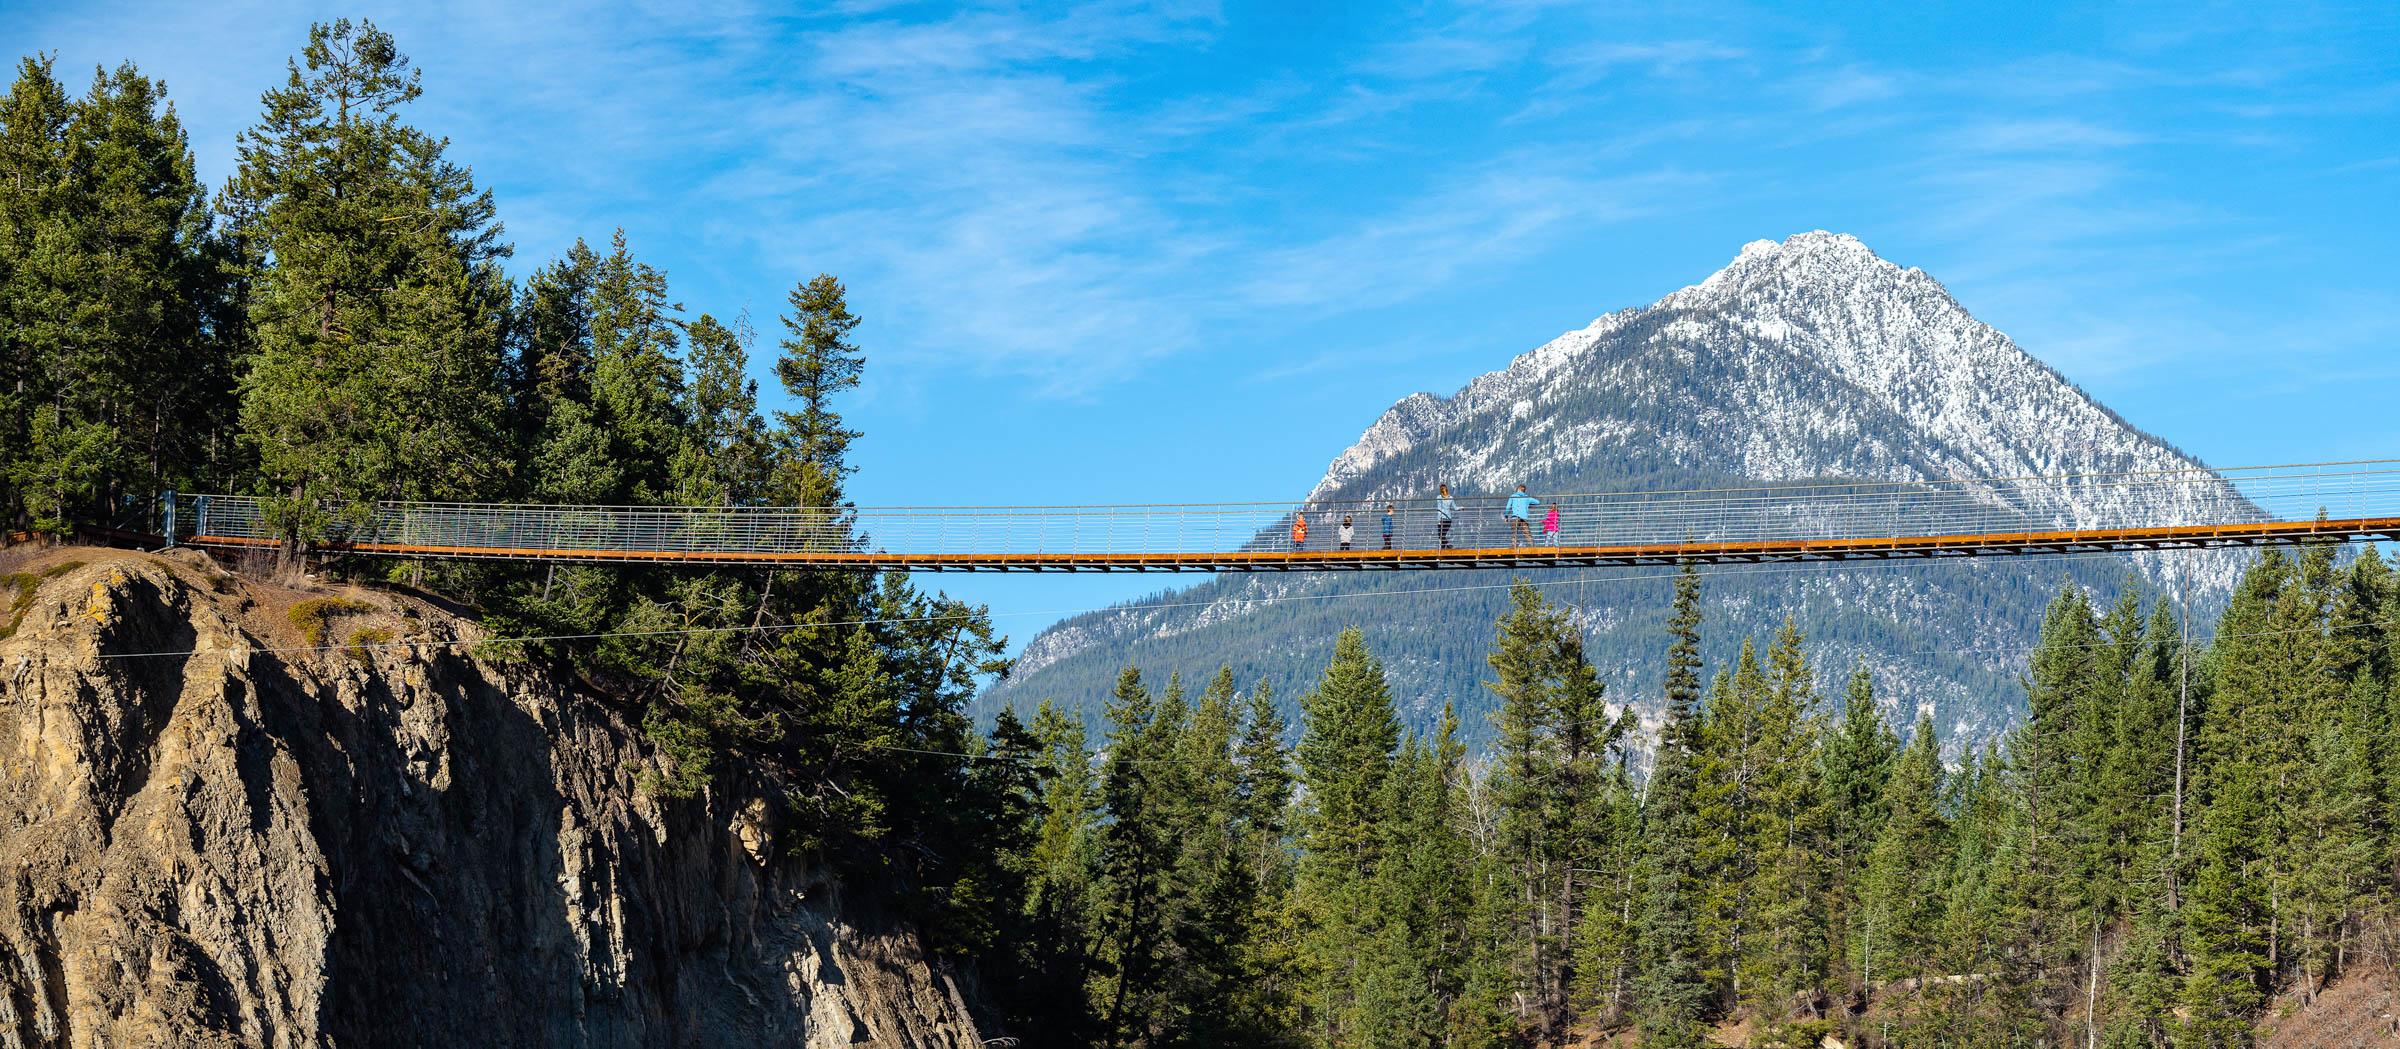 web_bridges_credit_maur_mere_rmap_2020_1